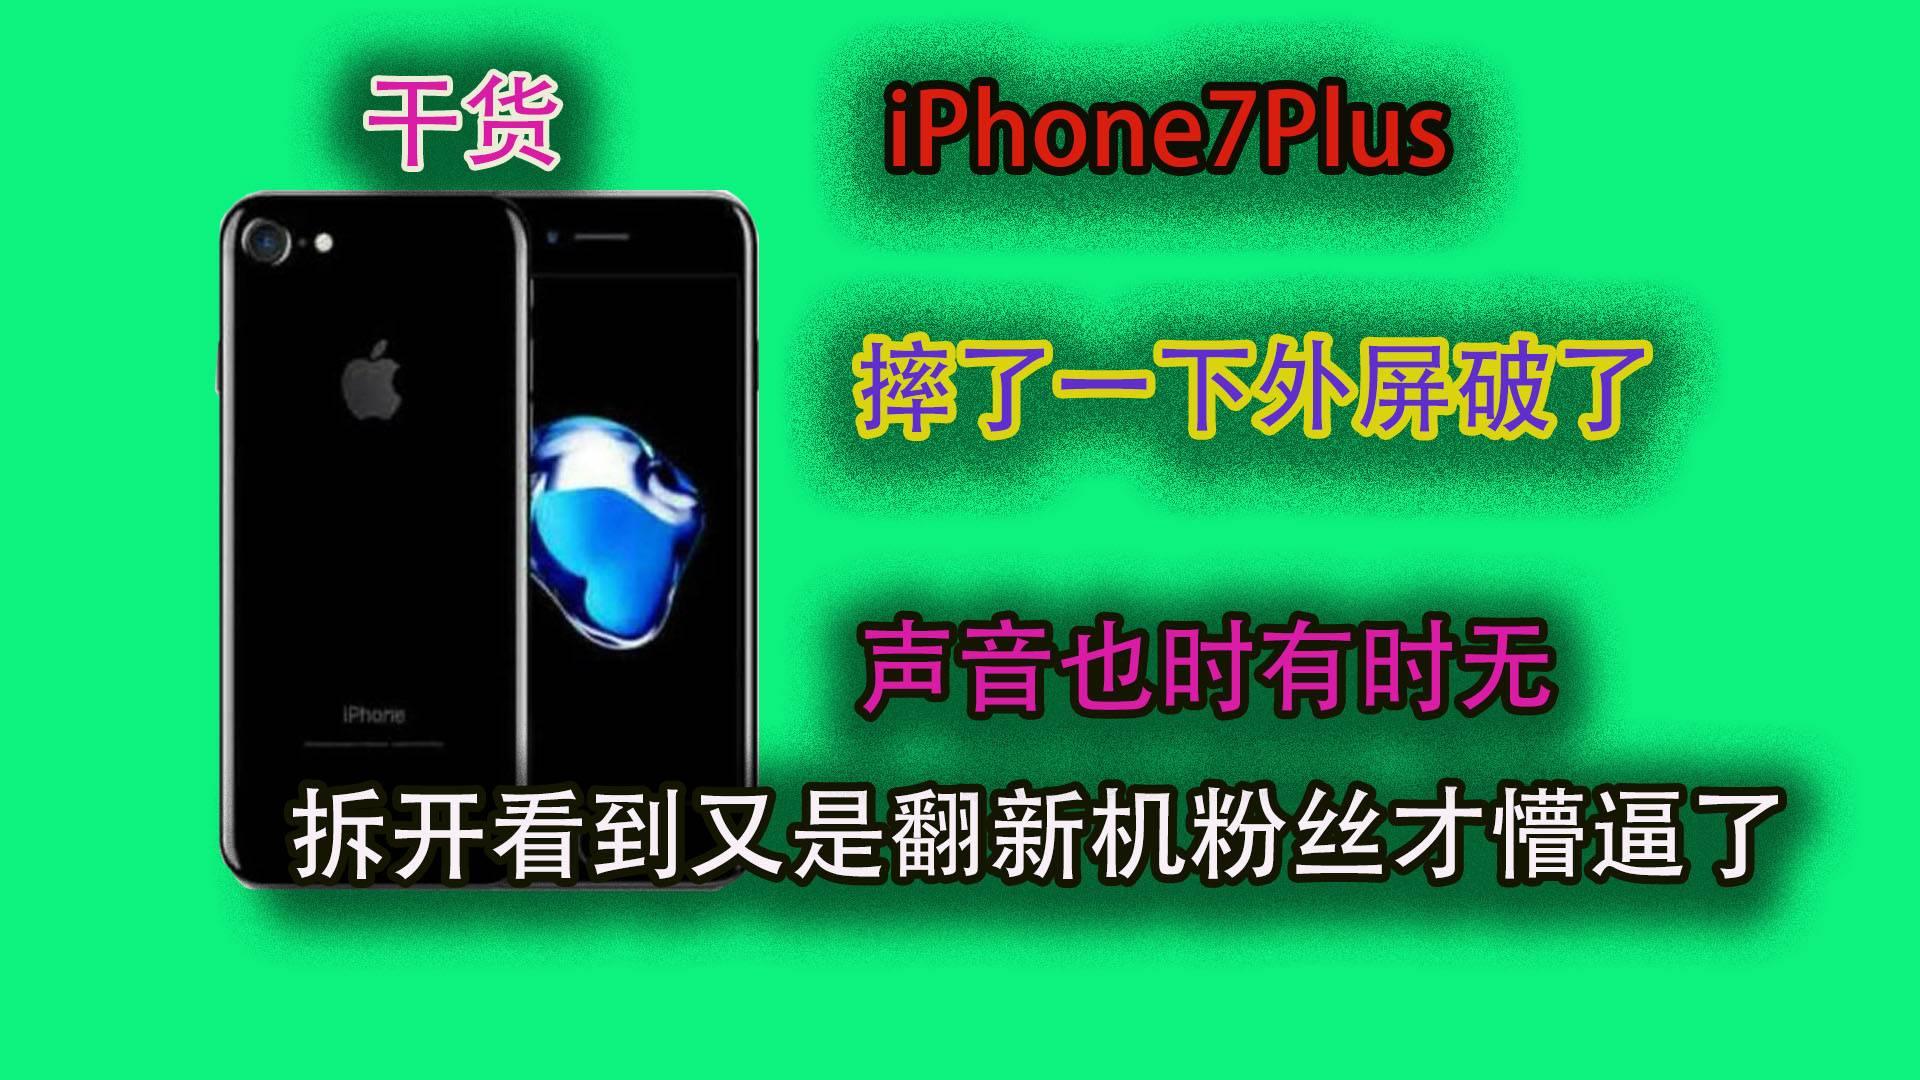 iPhone7Plus外屏摔破了,打电话免提灰色录音也打不开,拆开以后是台翻新机!